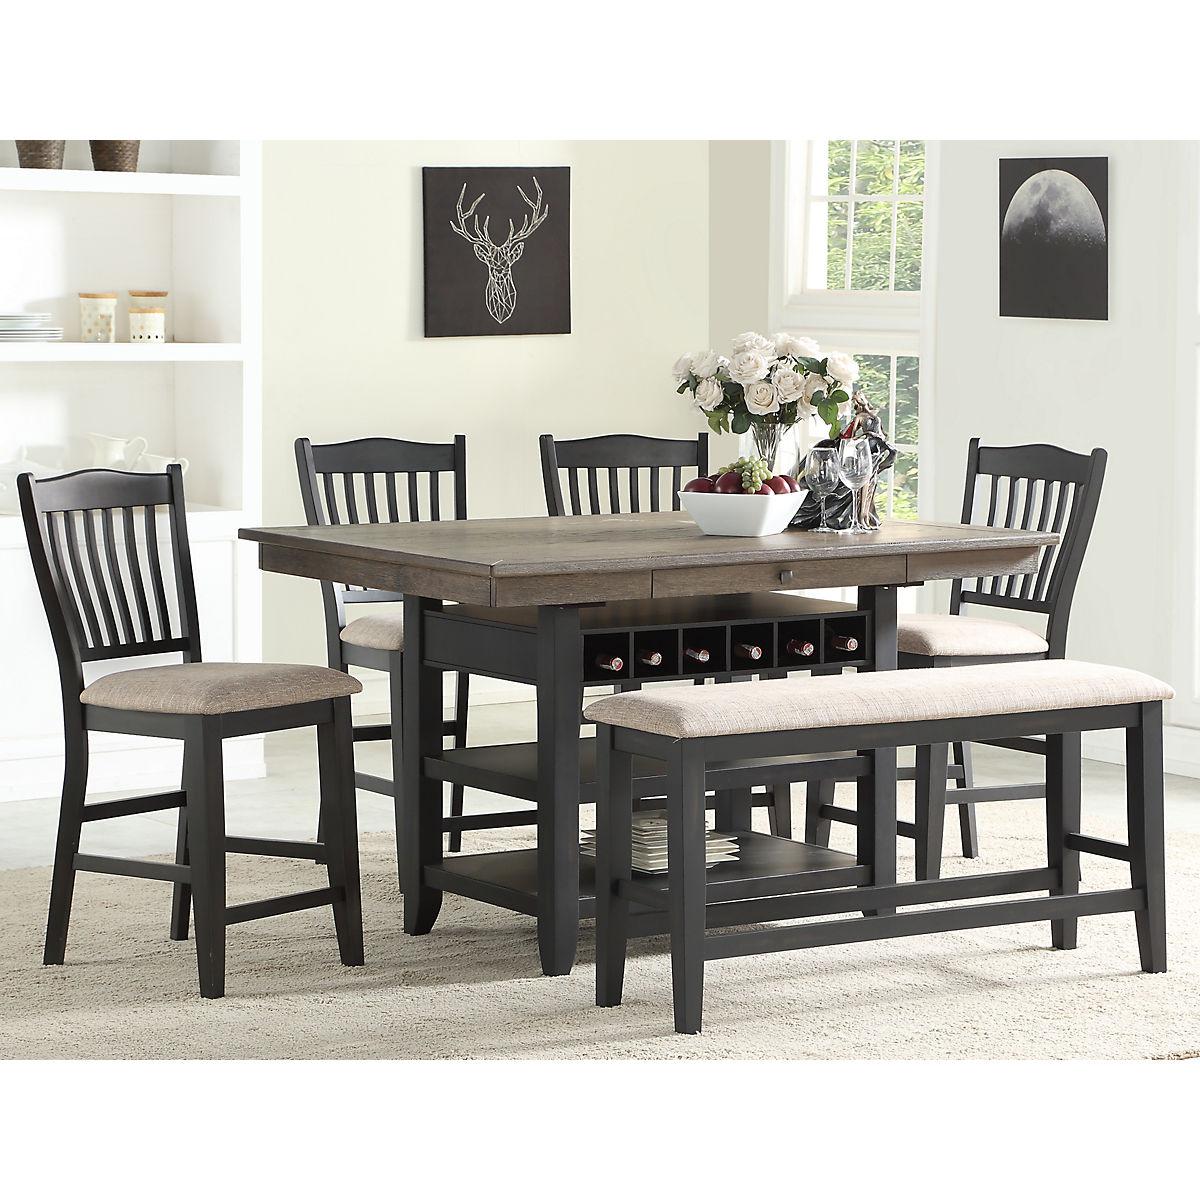 Garth 5 Piece Counter Height Black Dining Set | Star Furniture